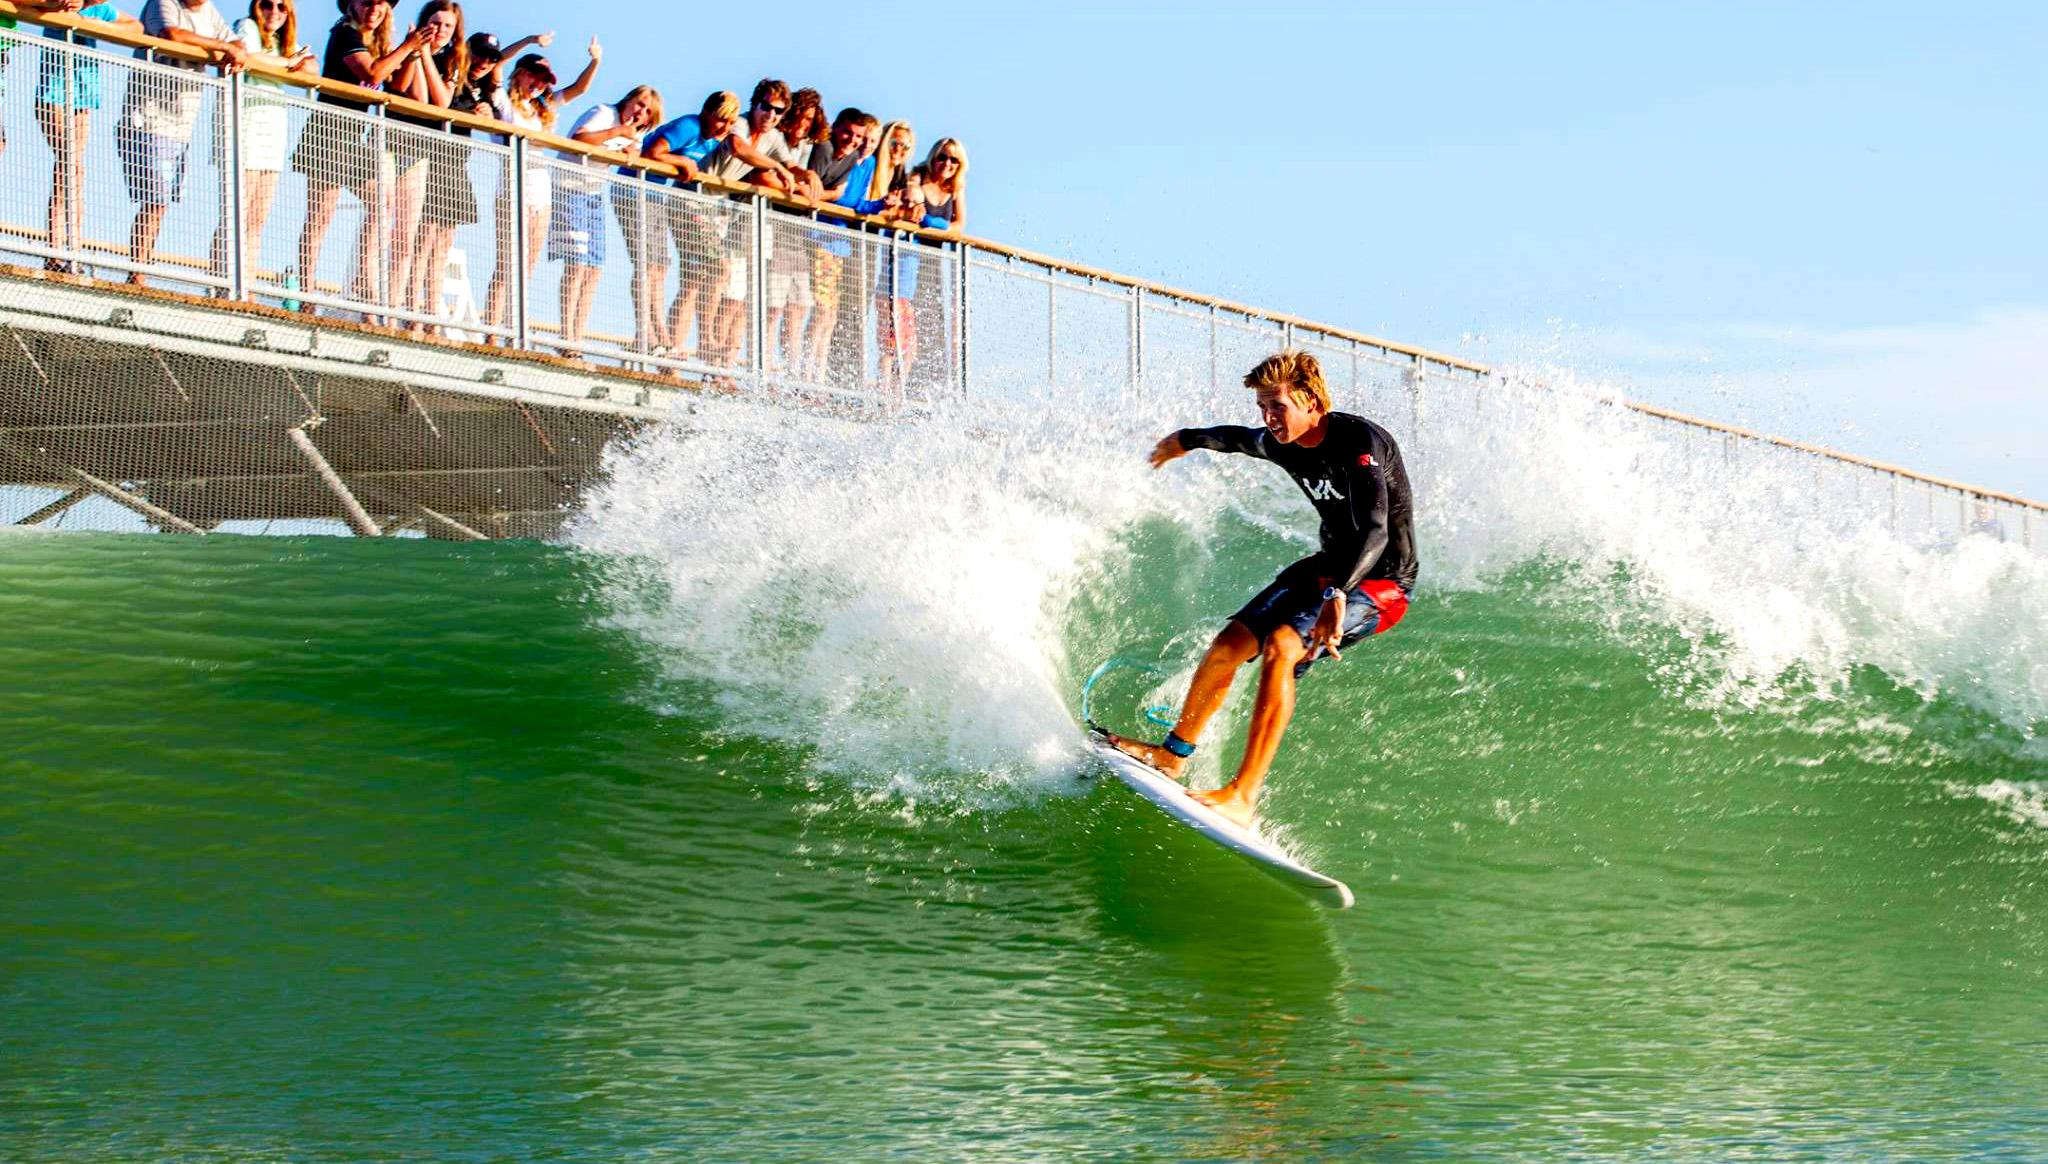 Image of NLand Surf Park